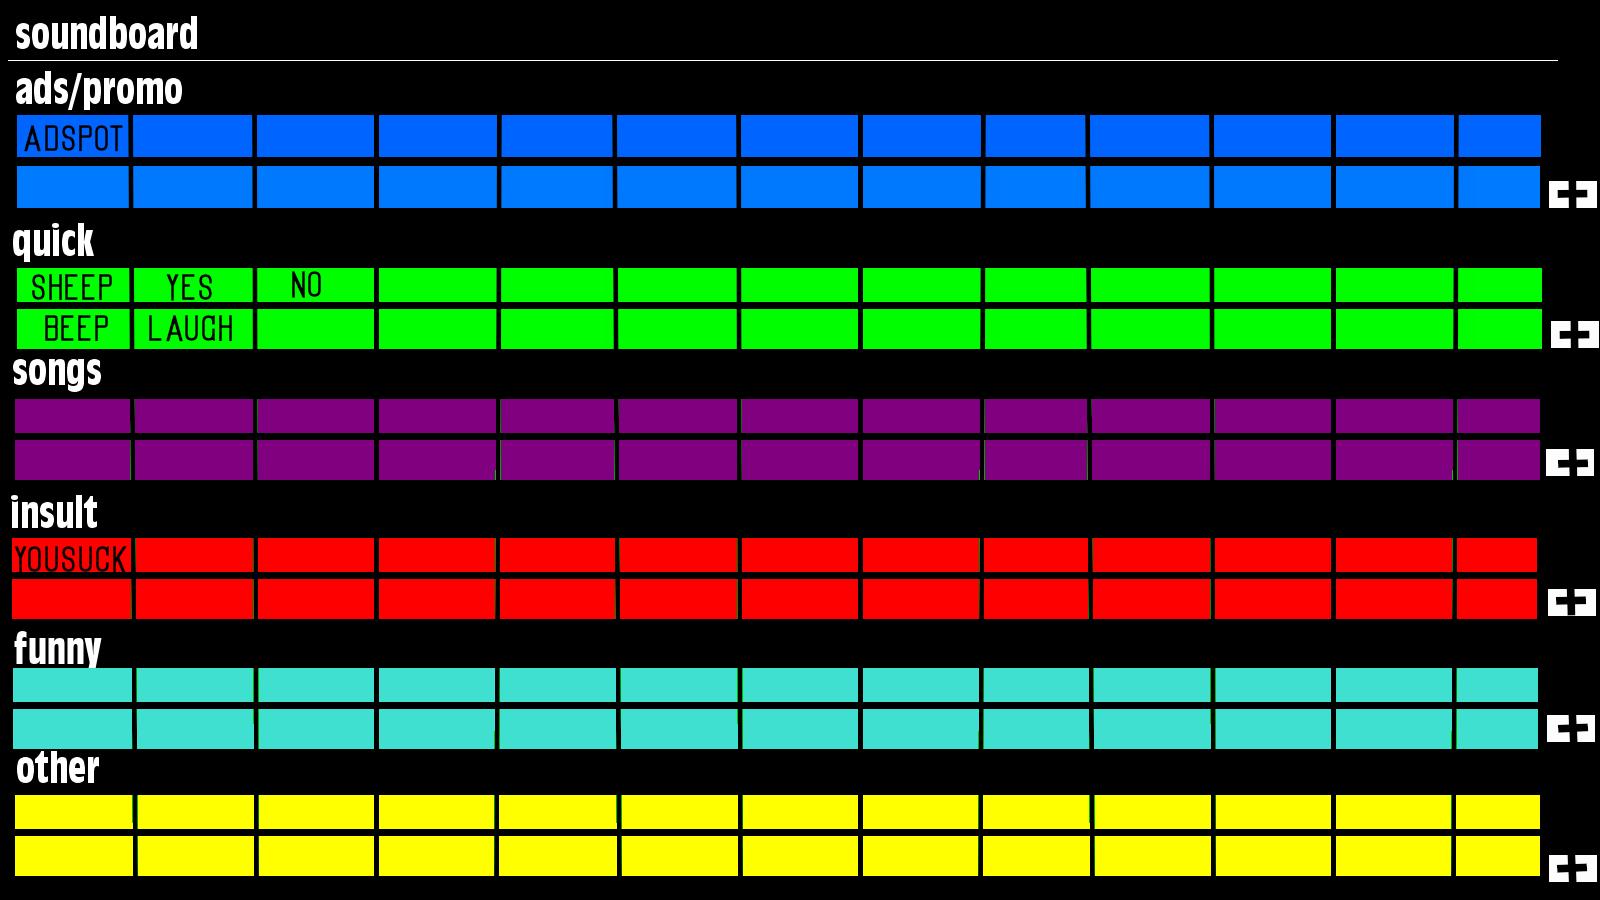 Need a Simple Soundboard for desktop/responsive